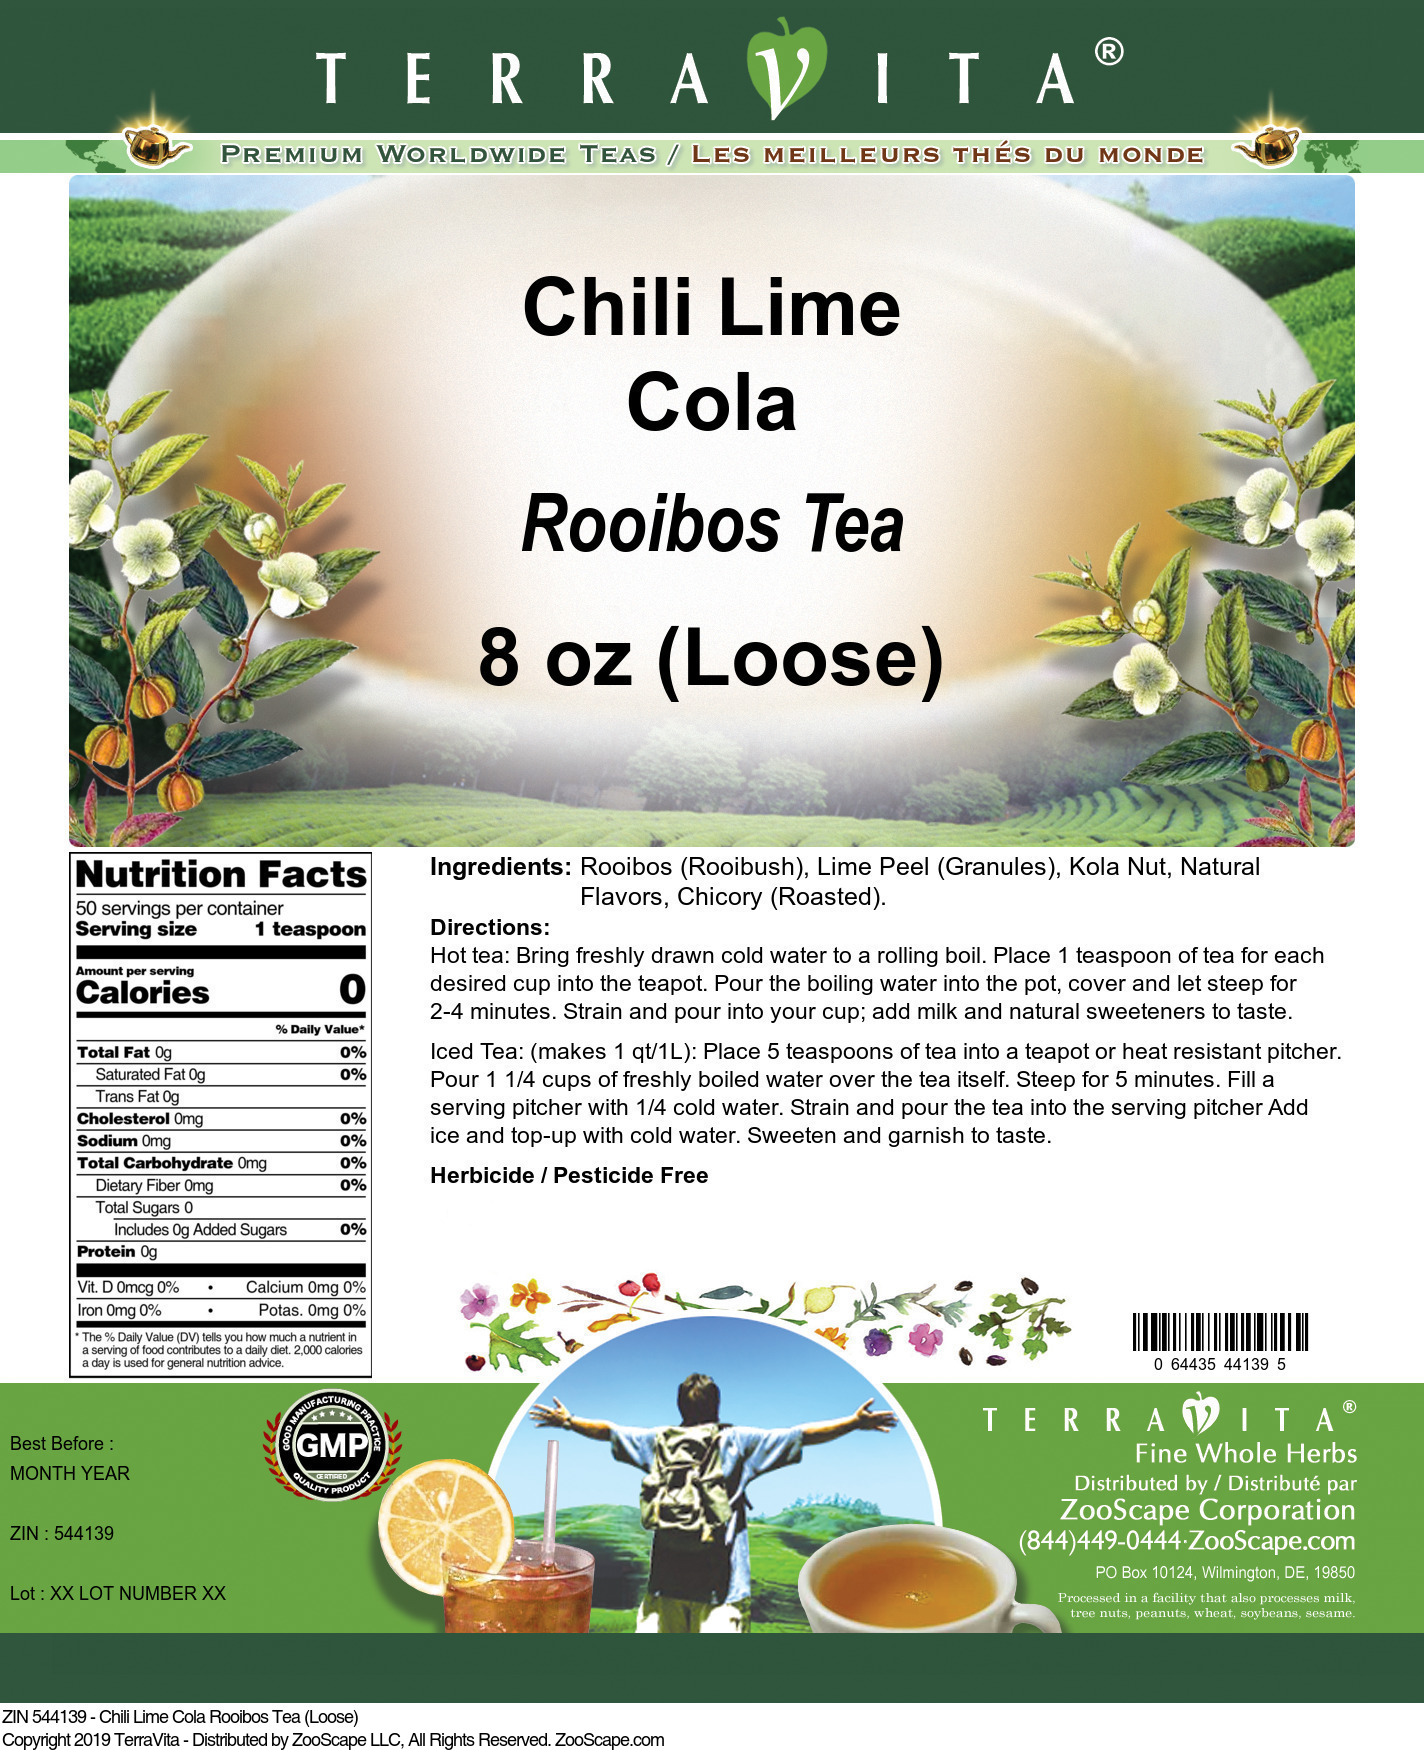 Chili Lime Cola Rooibos Tea (Loose)